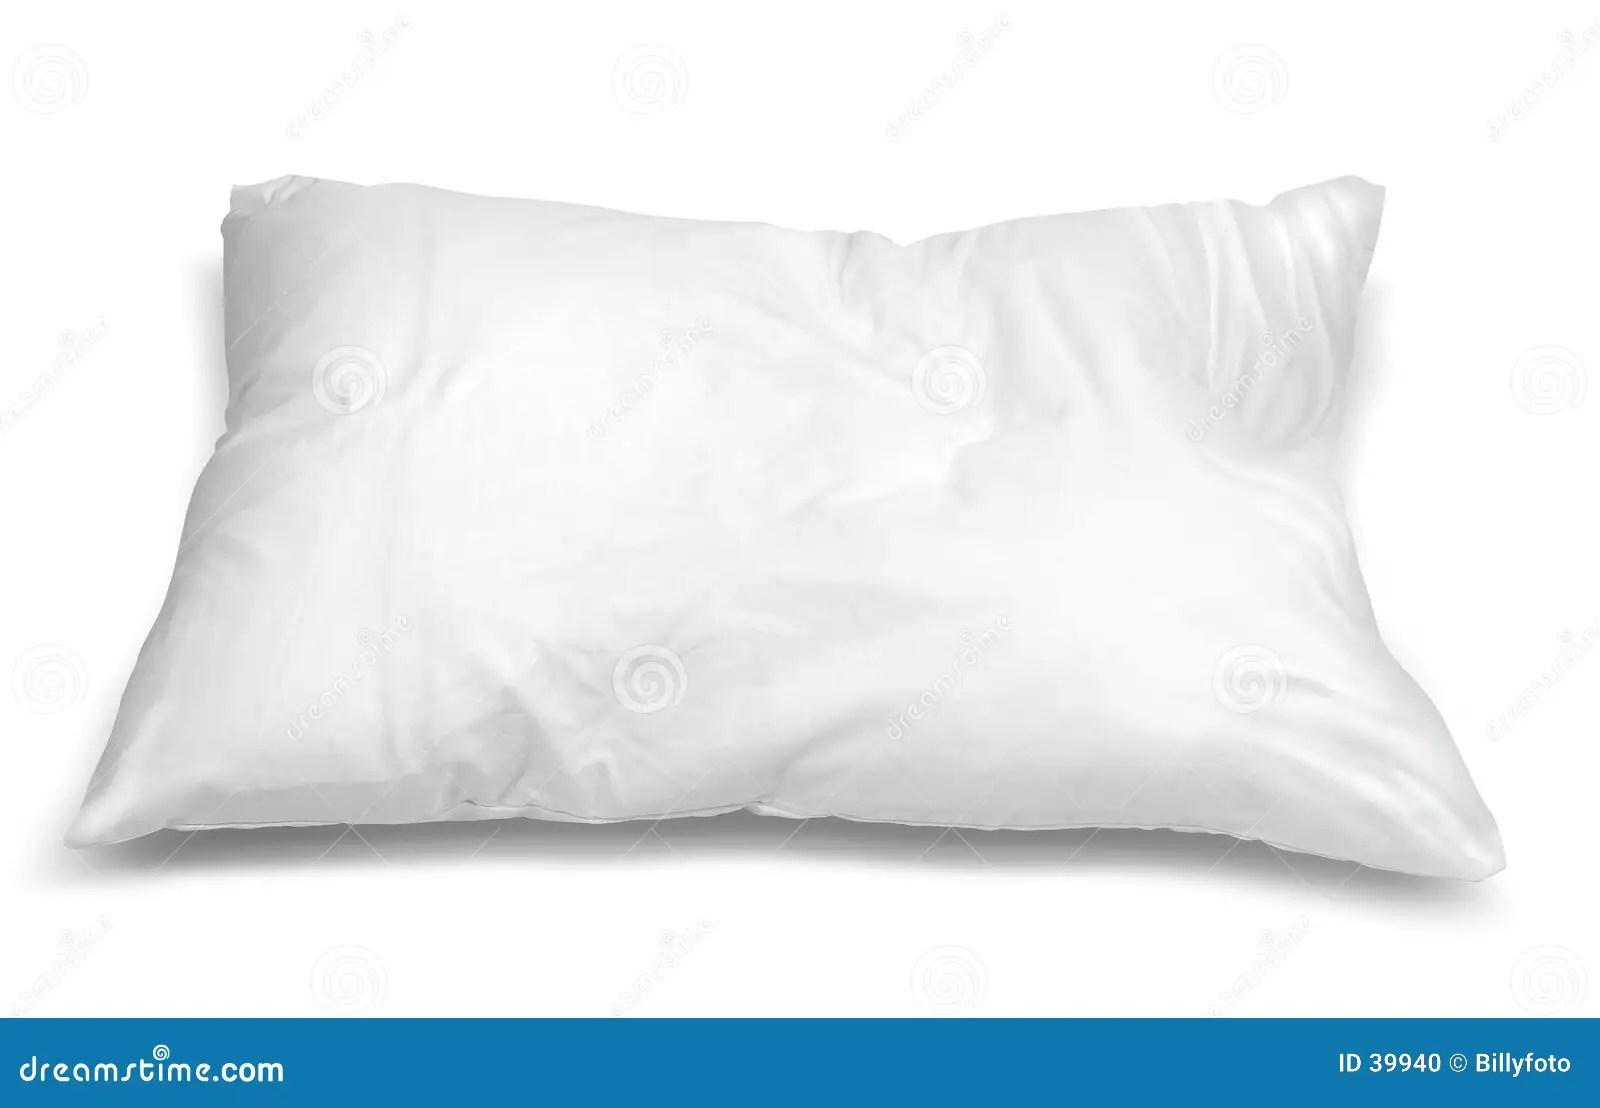 Pillow stock photo Image of feeling object sleep warm